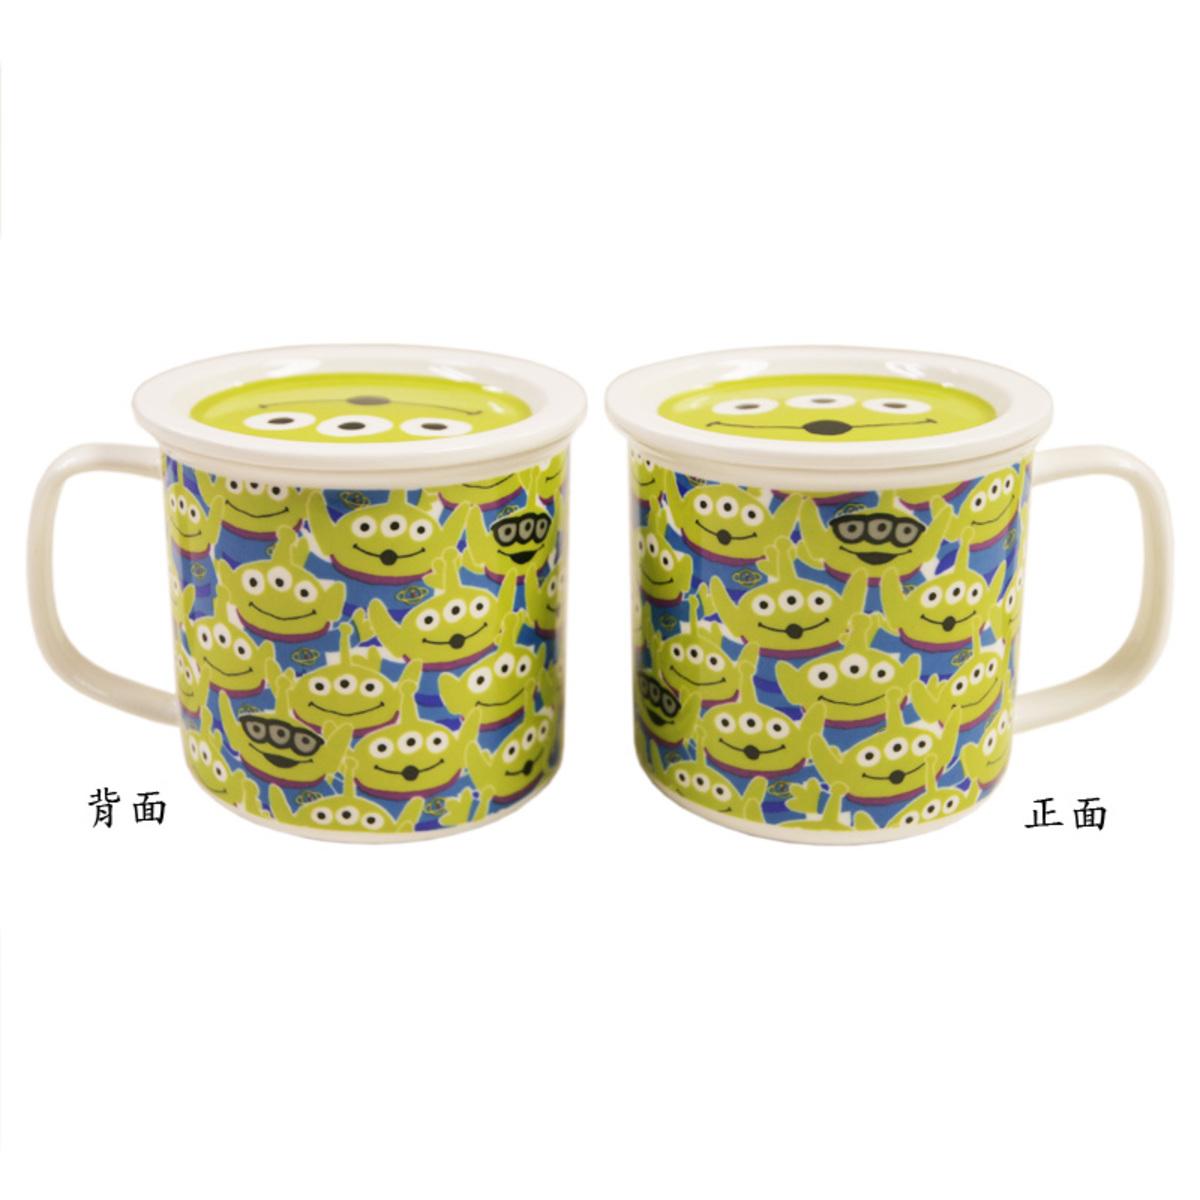 Ceramic Mug with Lid (Alien) (Licensed by Disney)